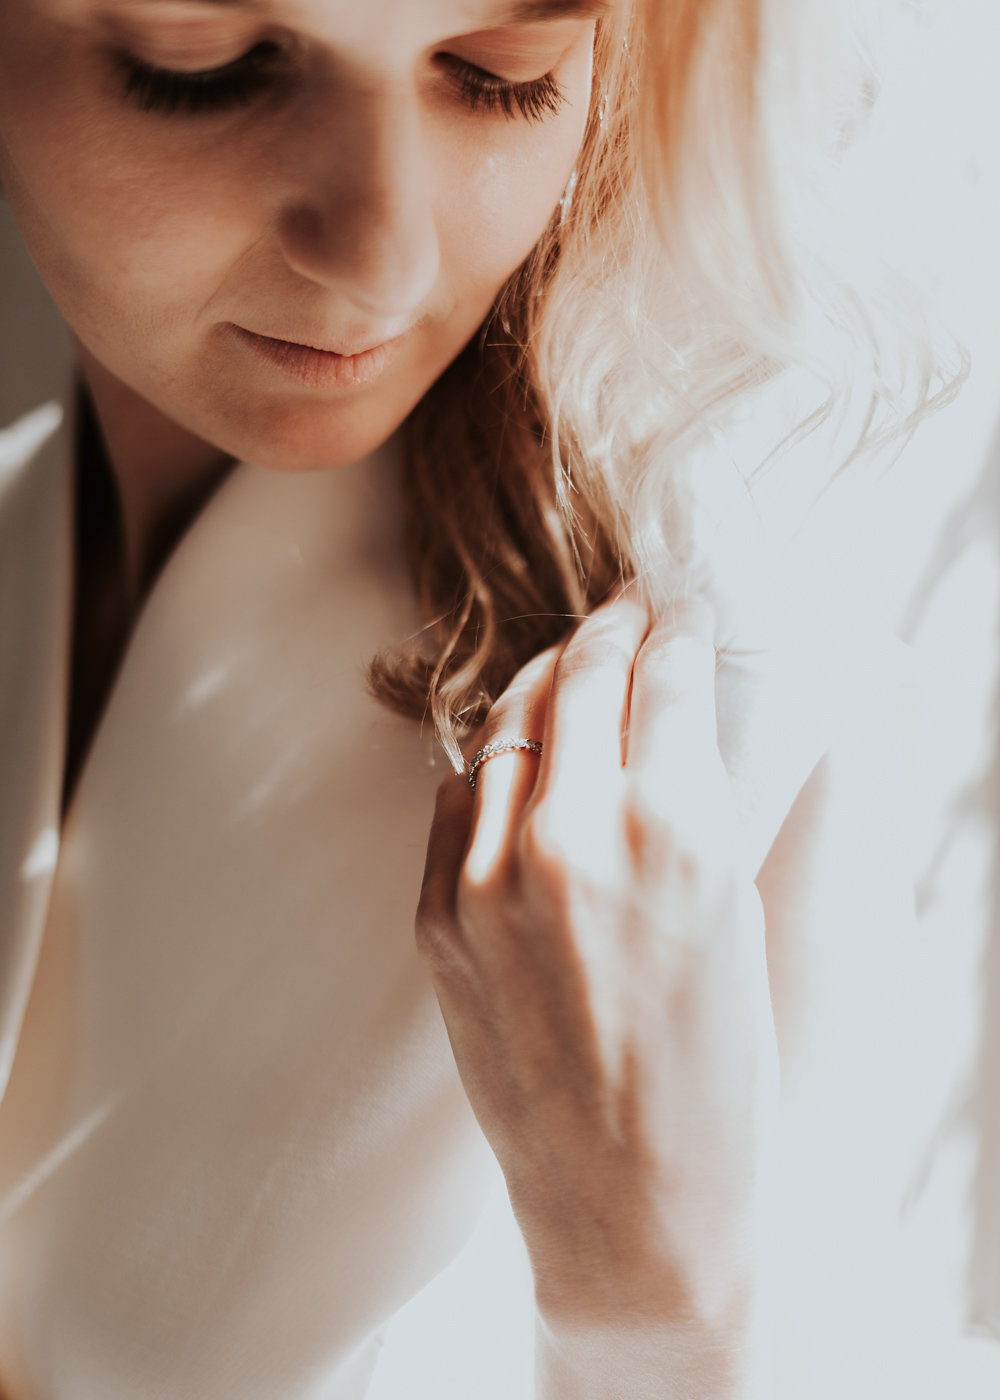 SarahOliviaPhoto-6205.jpg